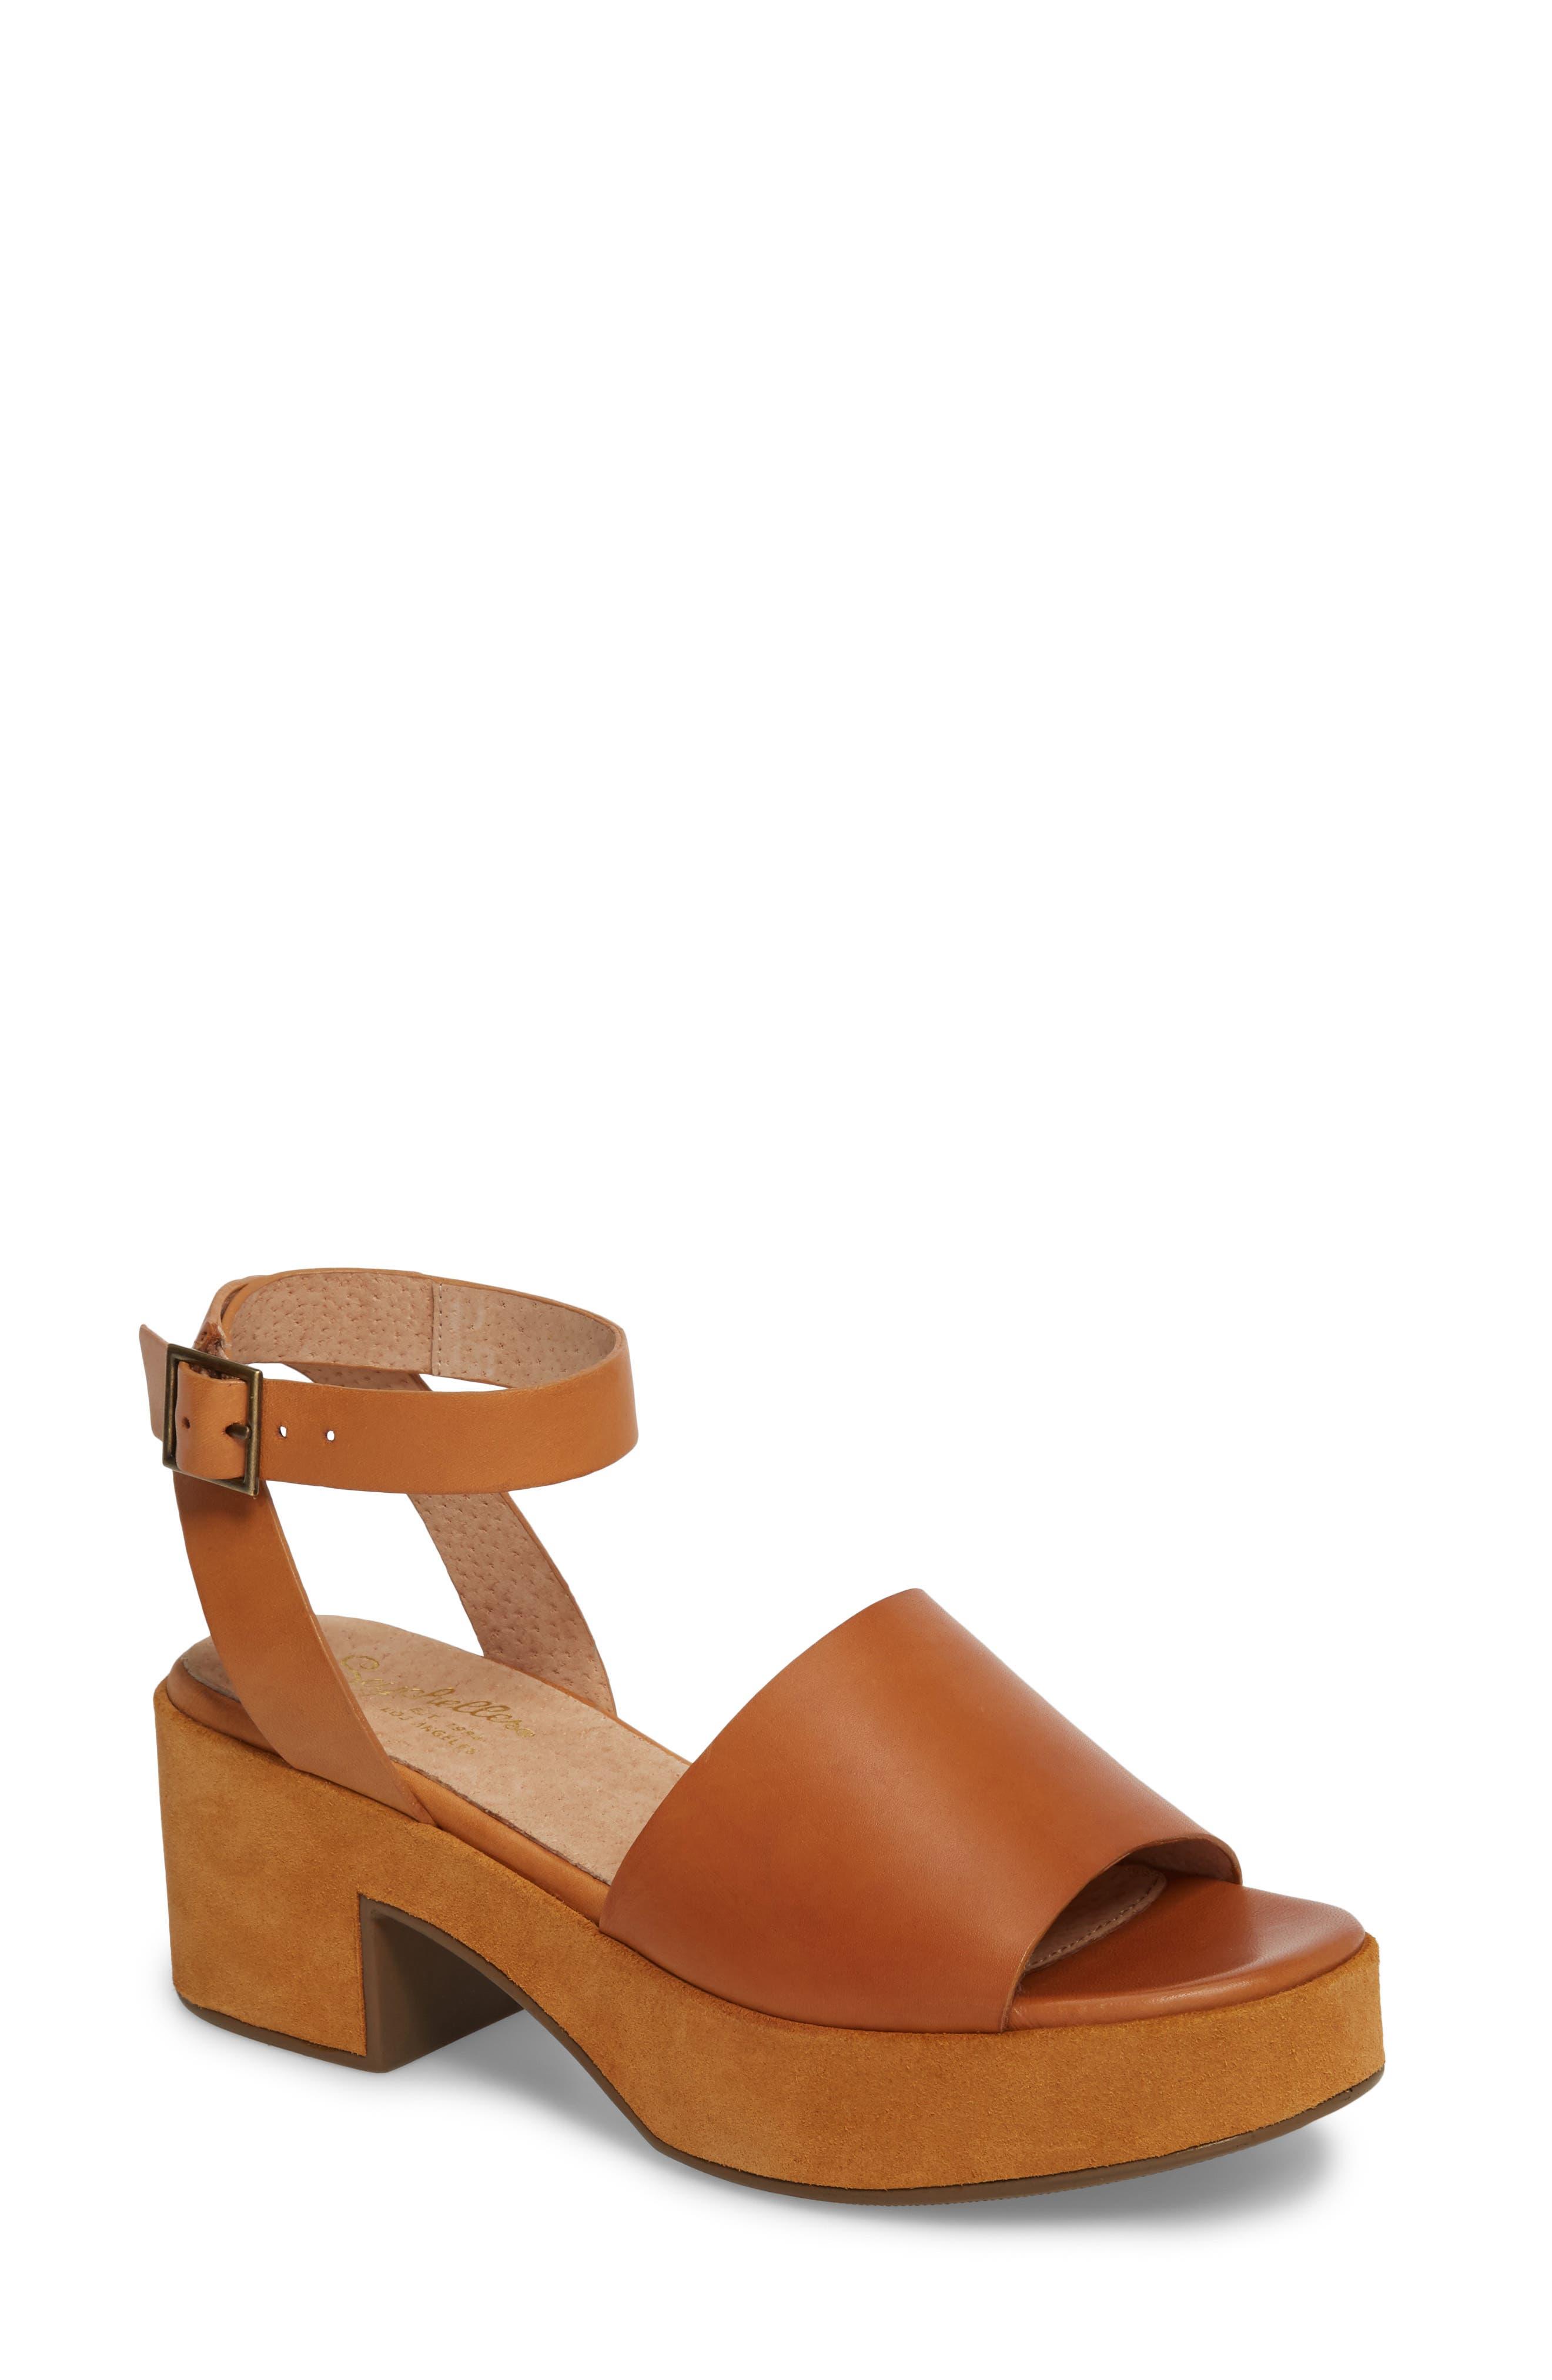 Calming Influence Platform Sandal,                         Main,                         color, TAN LEATHER